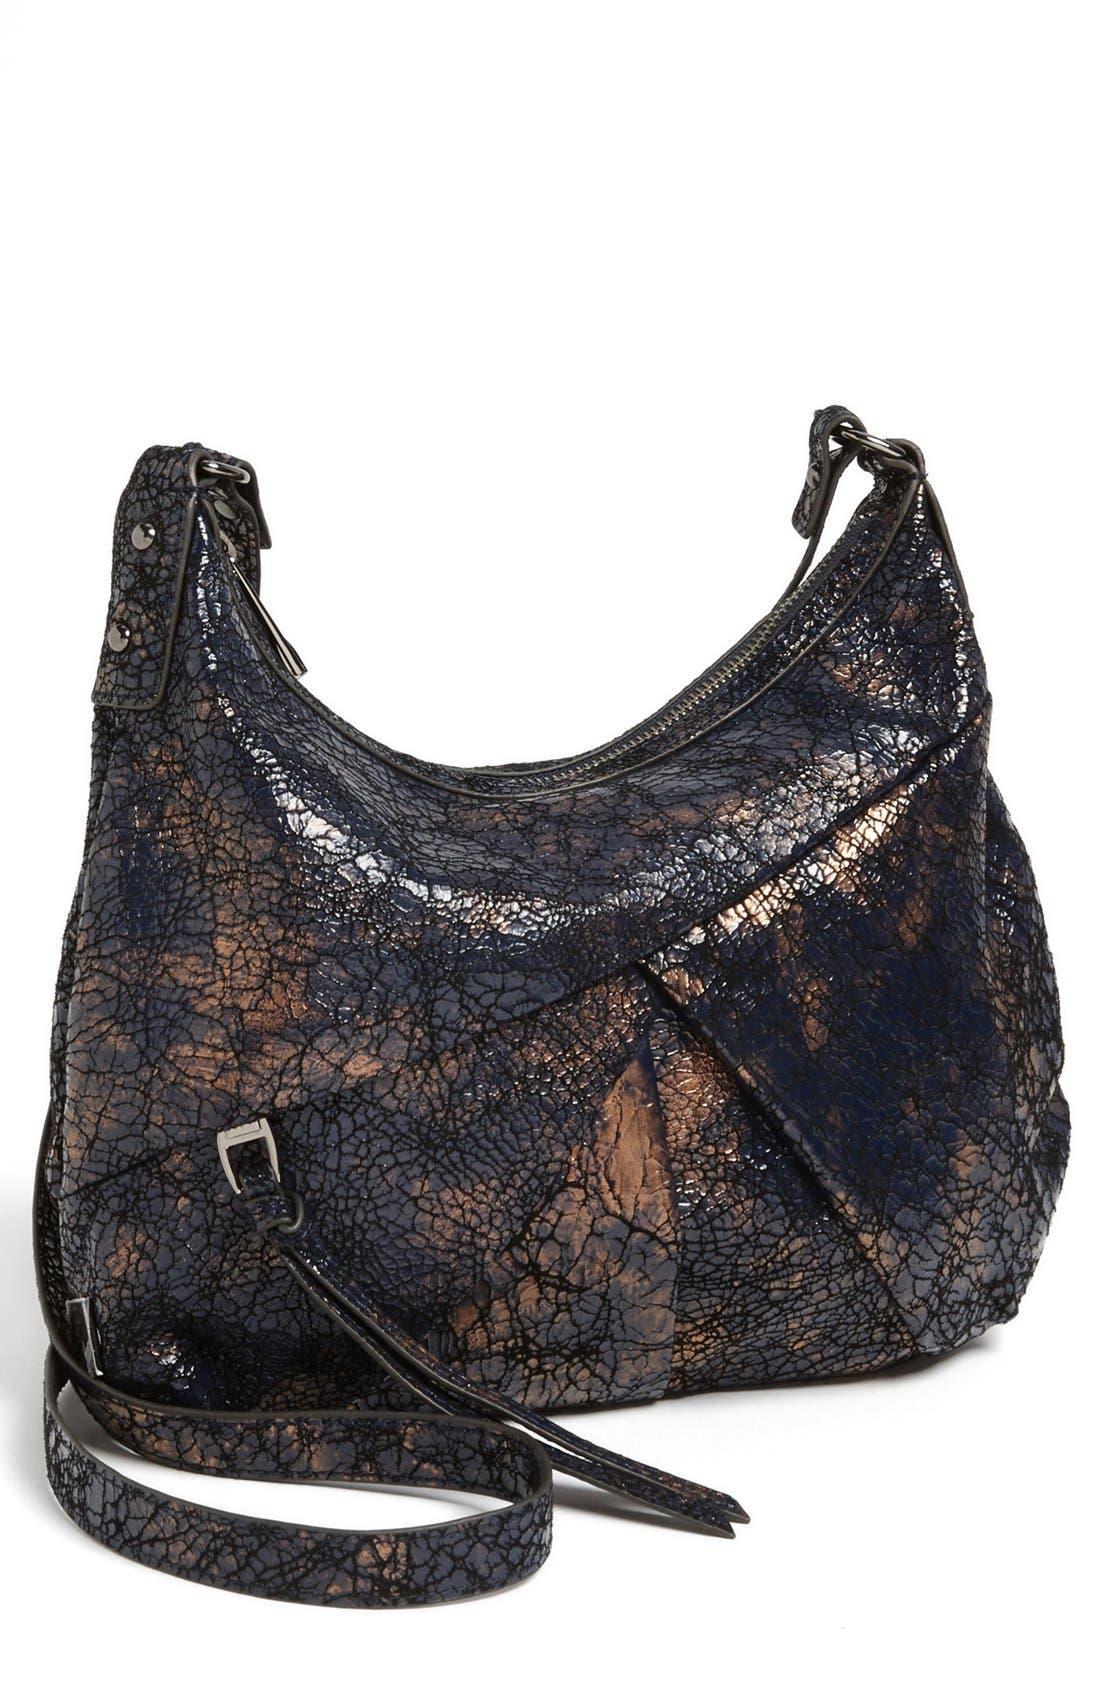 Main Image - Kooba 'Tia' Leather Crossbody Bag